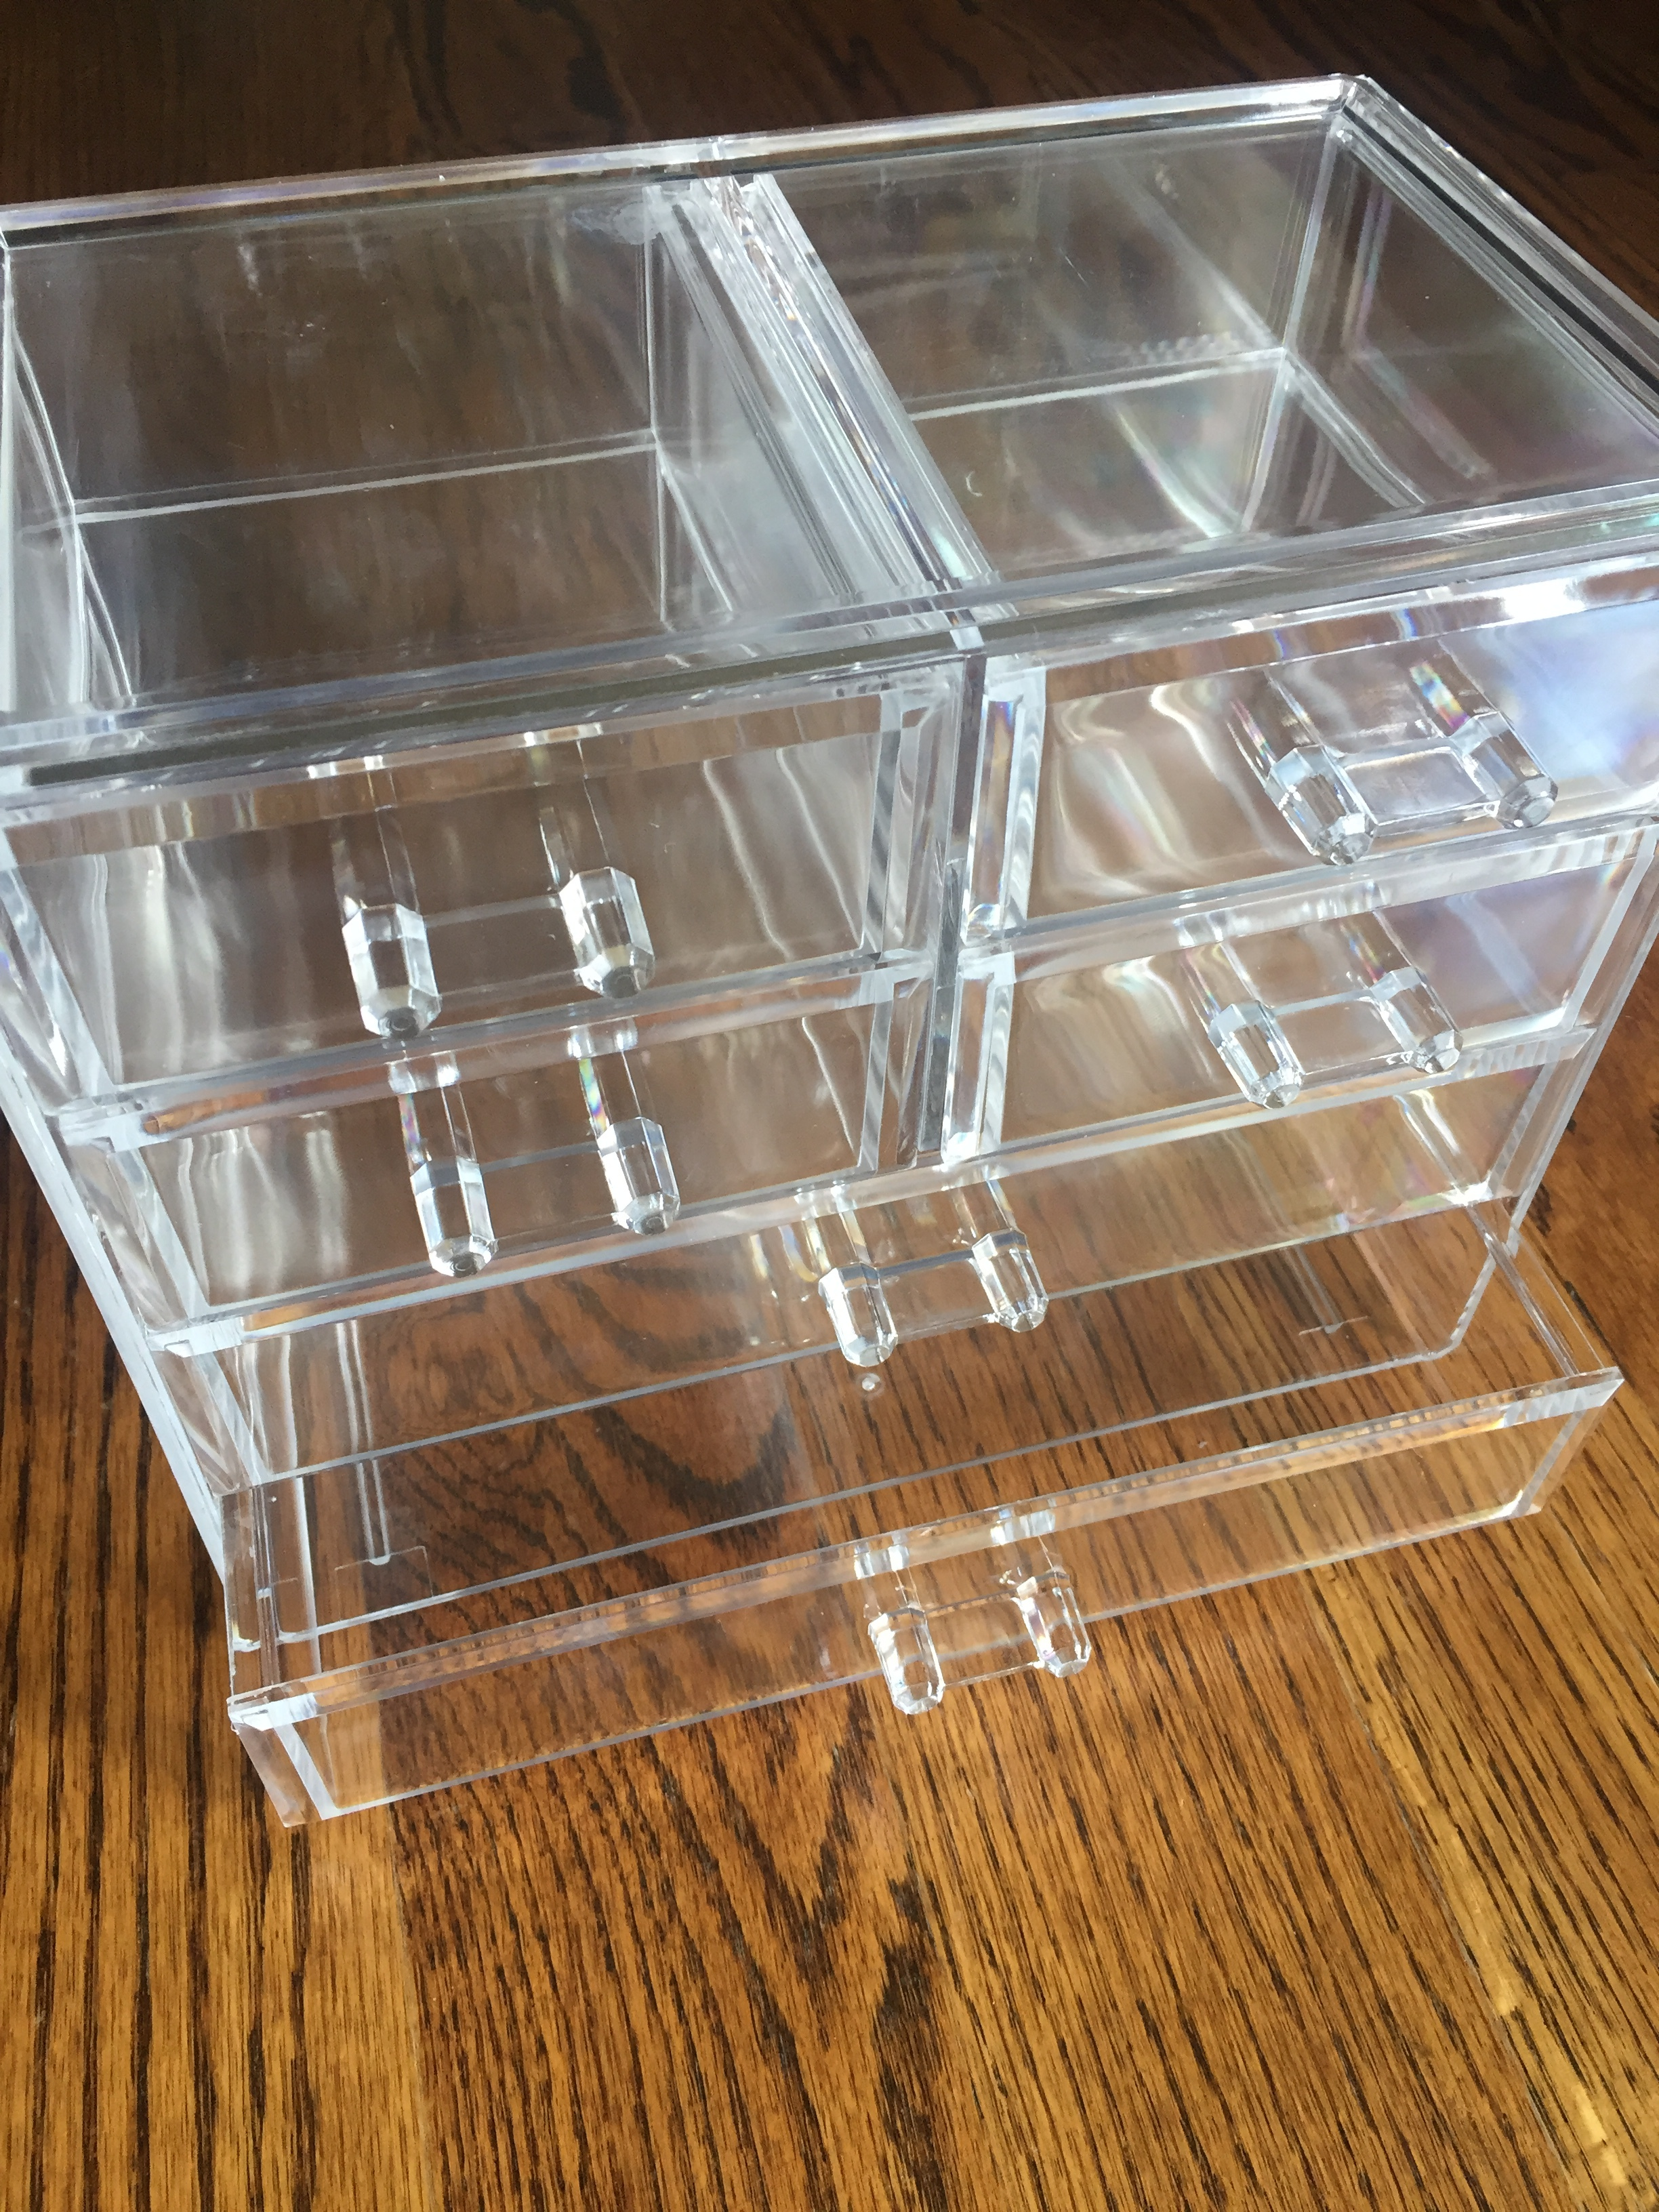 Similar Storage Boxx  here